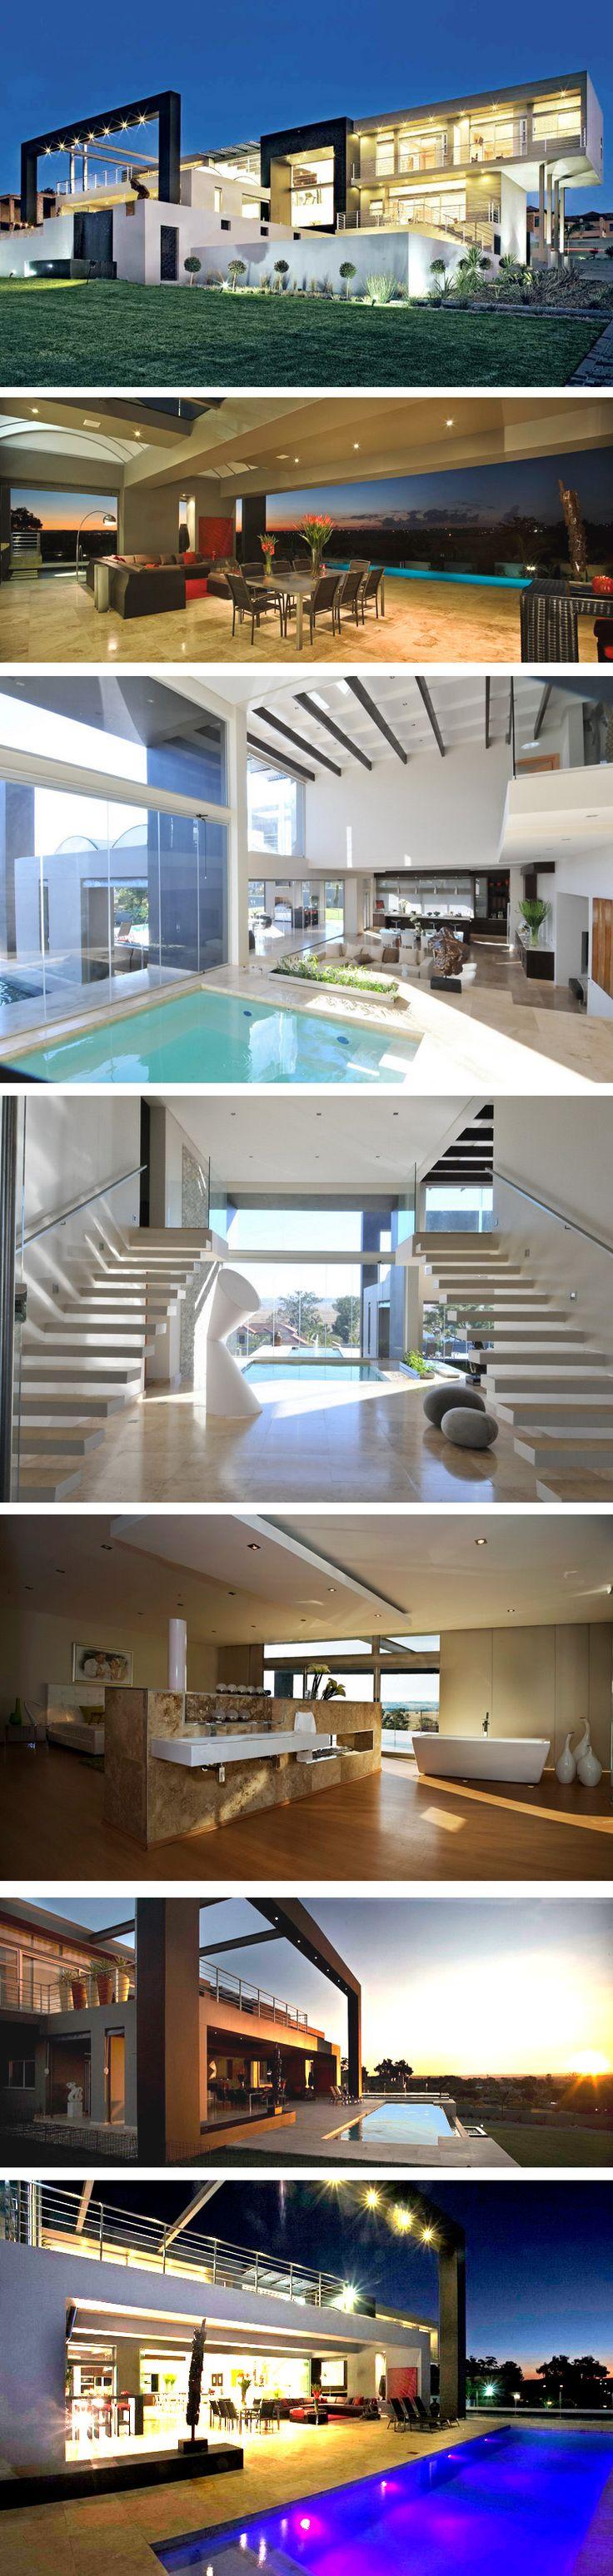 Joc Blue Hills, Canada.  Architects: Nico van der Meulen